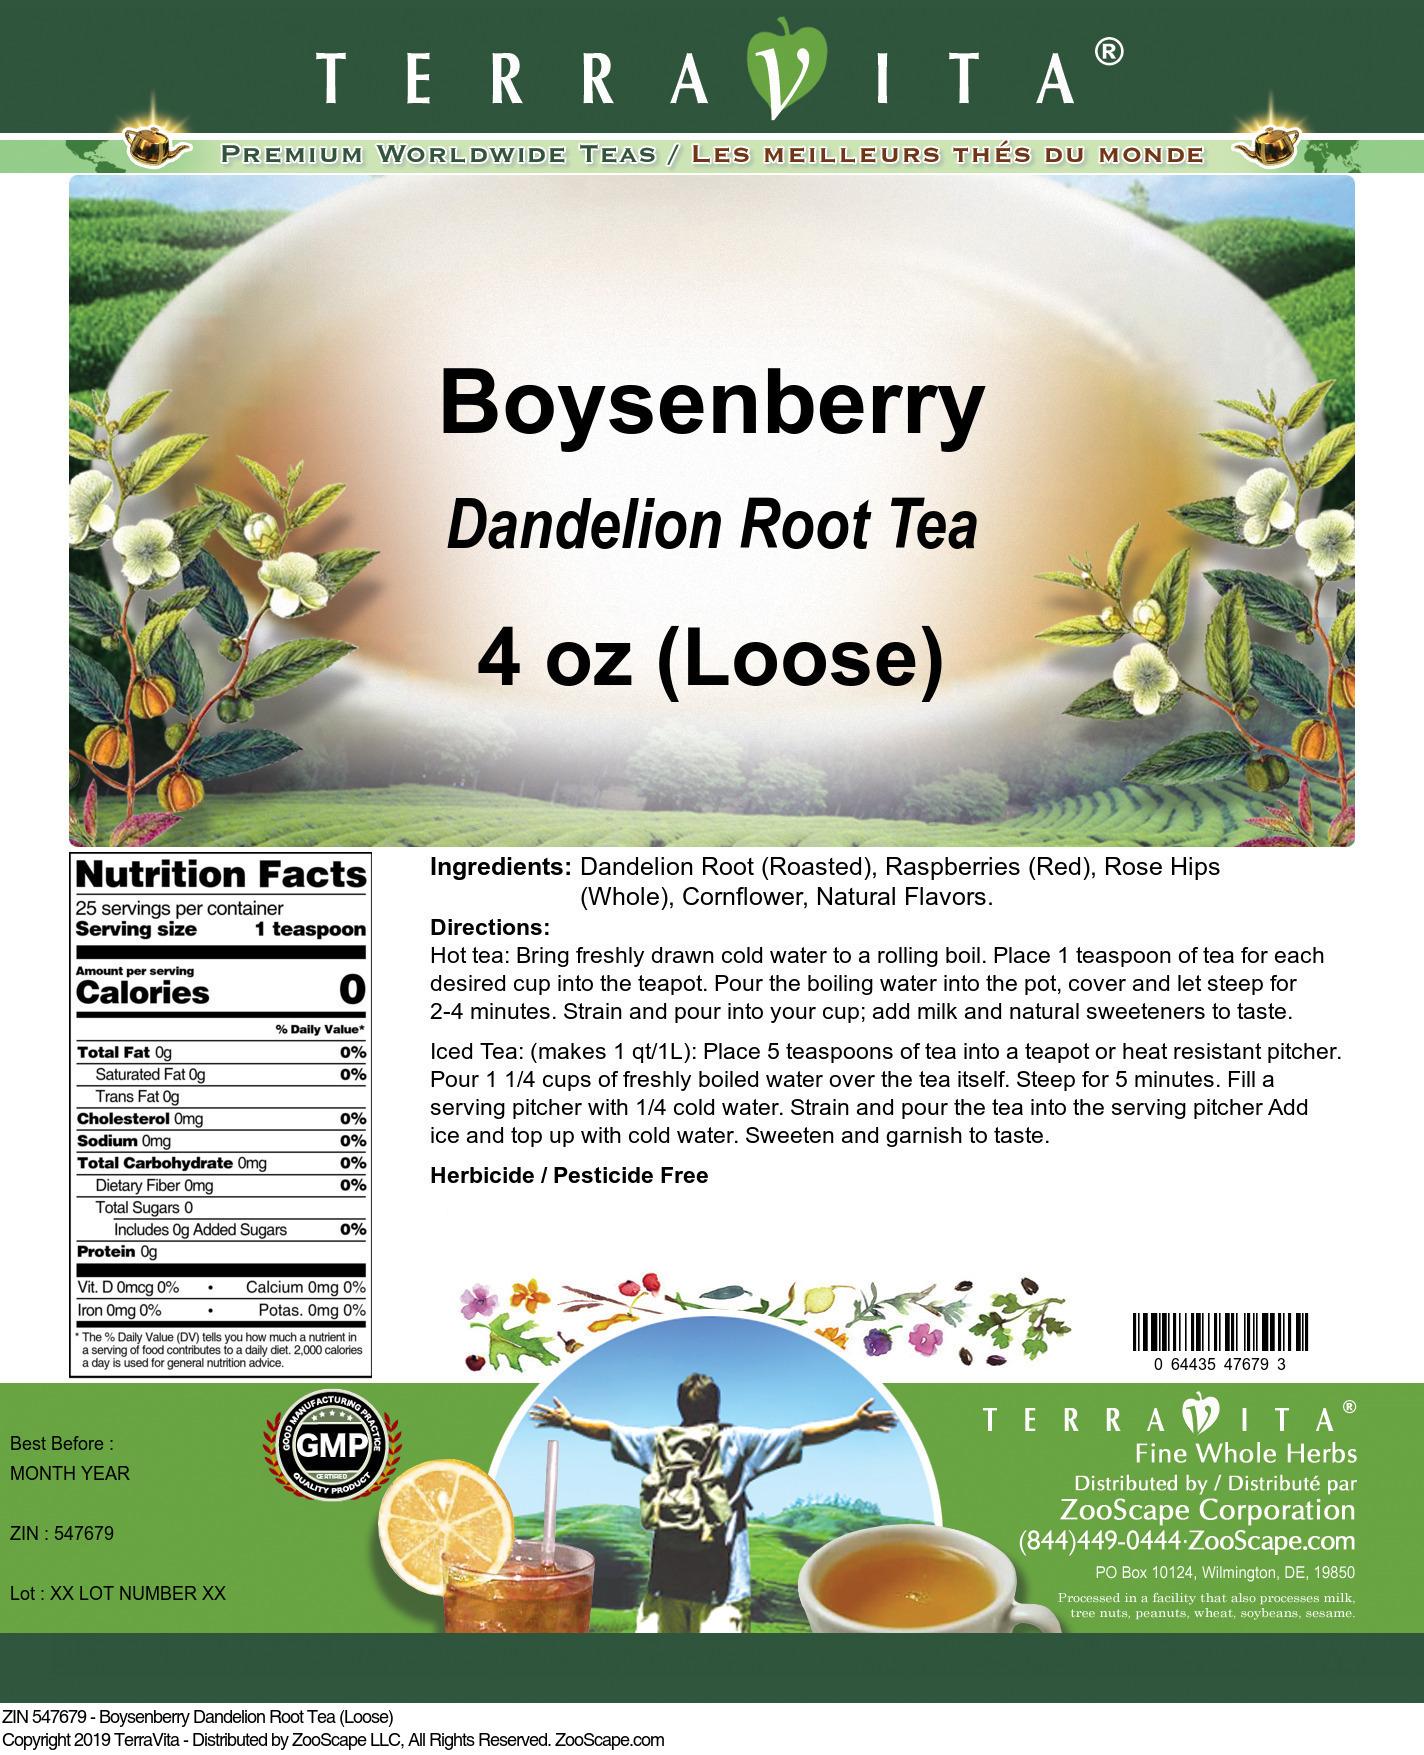 Boysenberry Dandelion Root Tea (Loose)